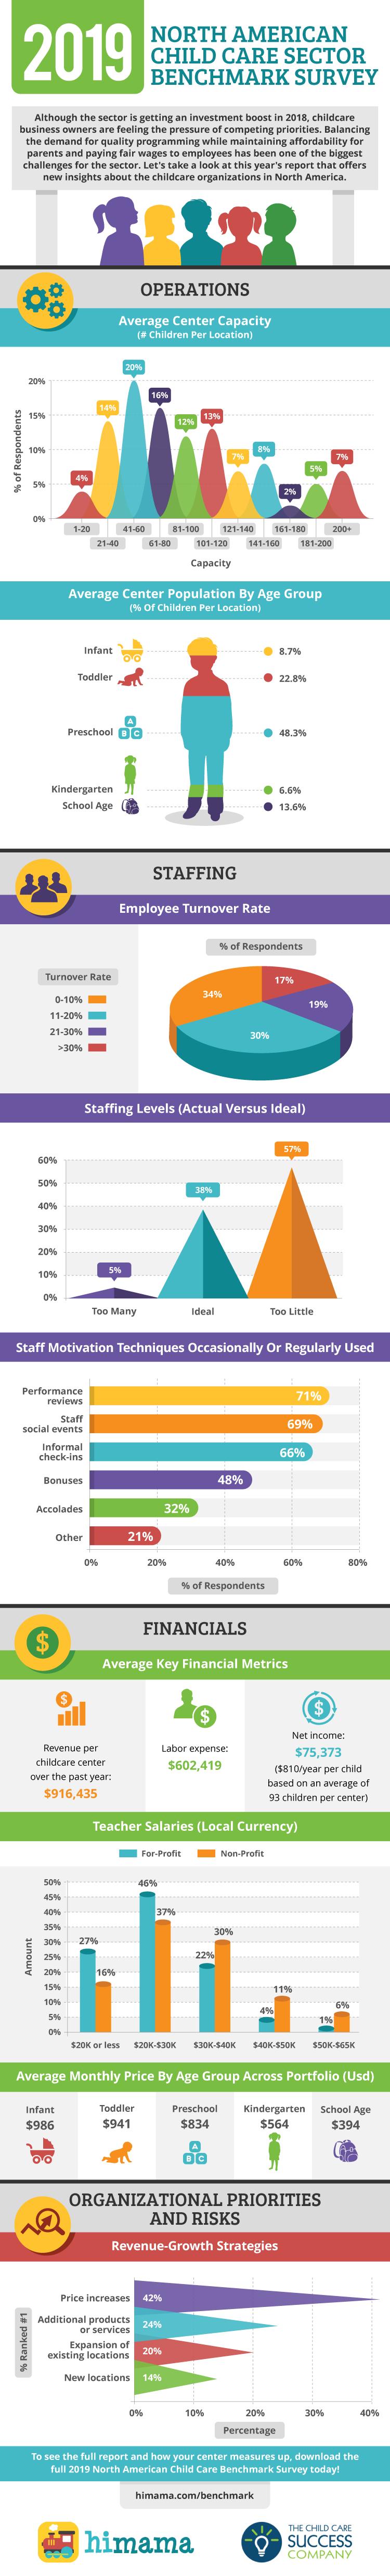 2019 child care benchmark survey infographic